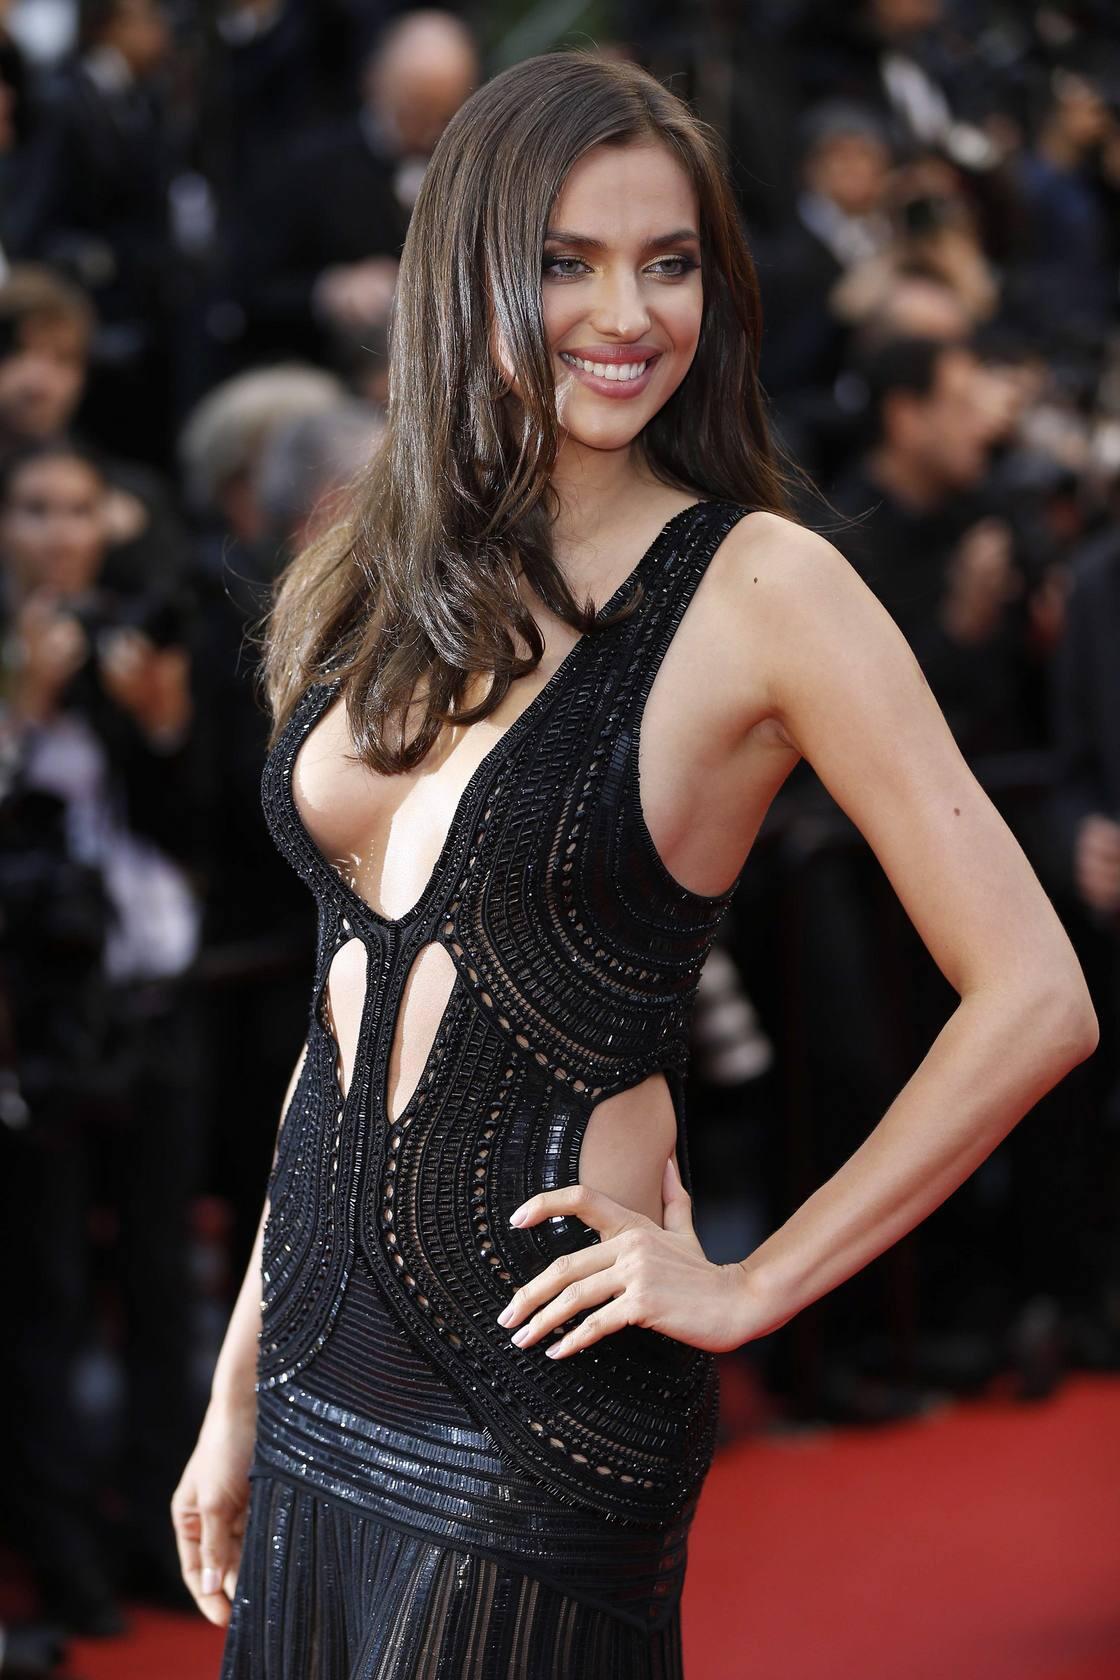 Irina Shayk revoluciona el Festival de Cannes